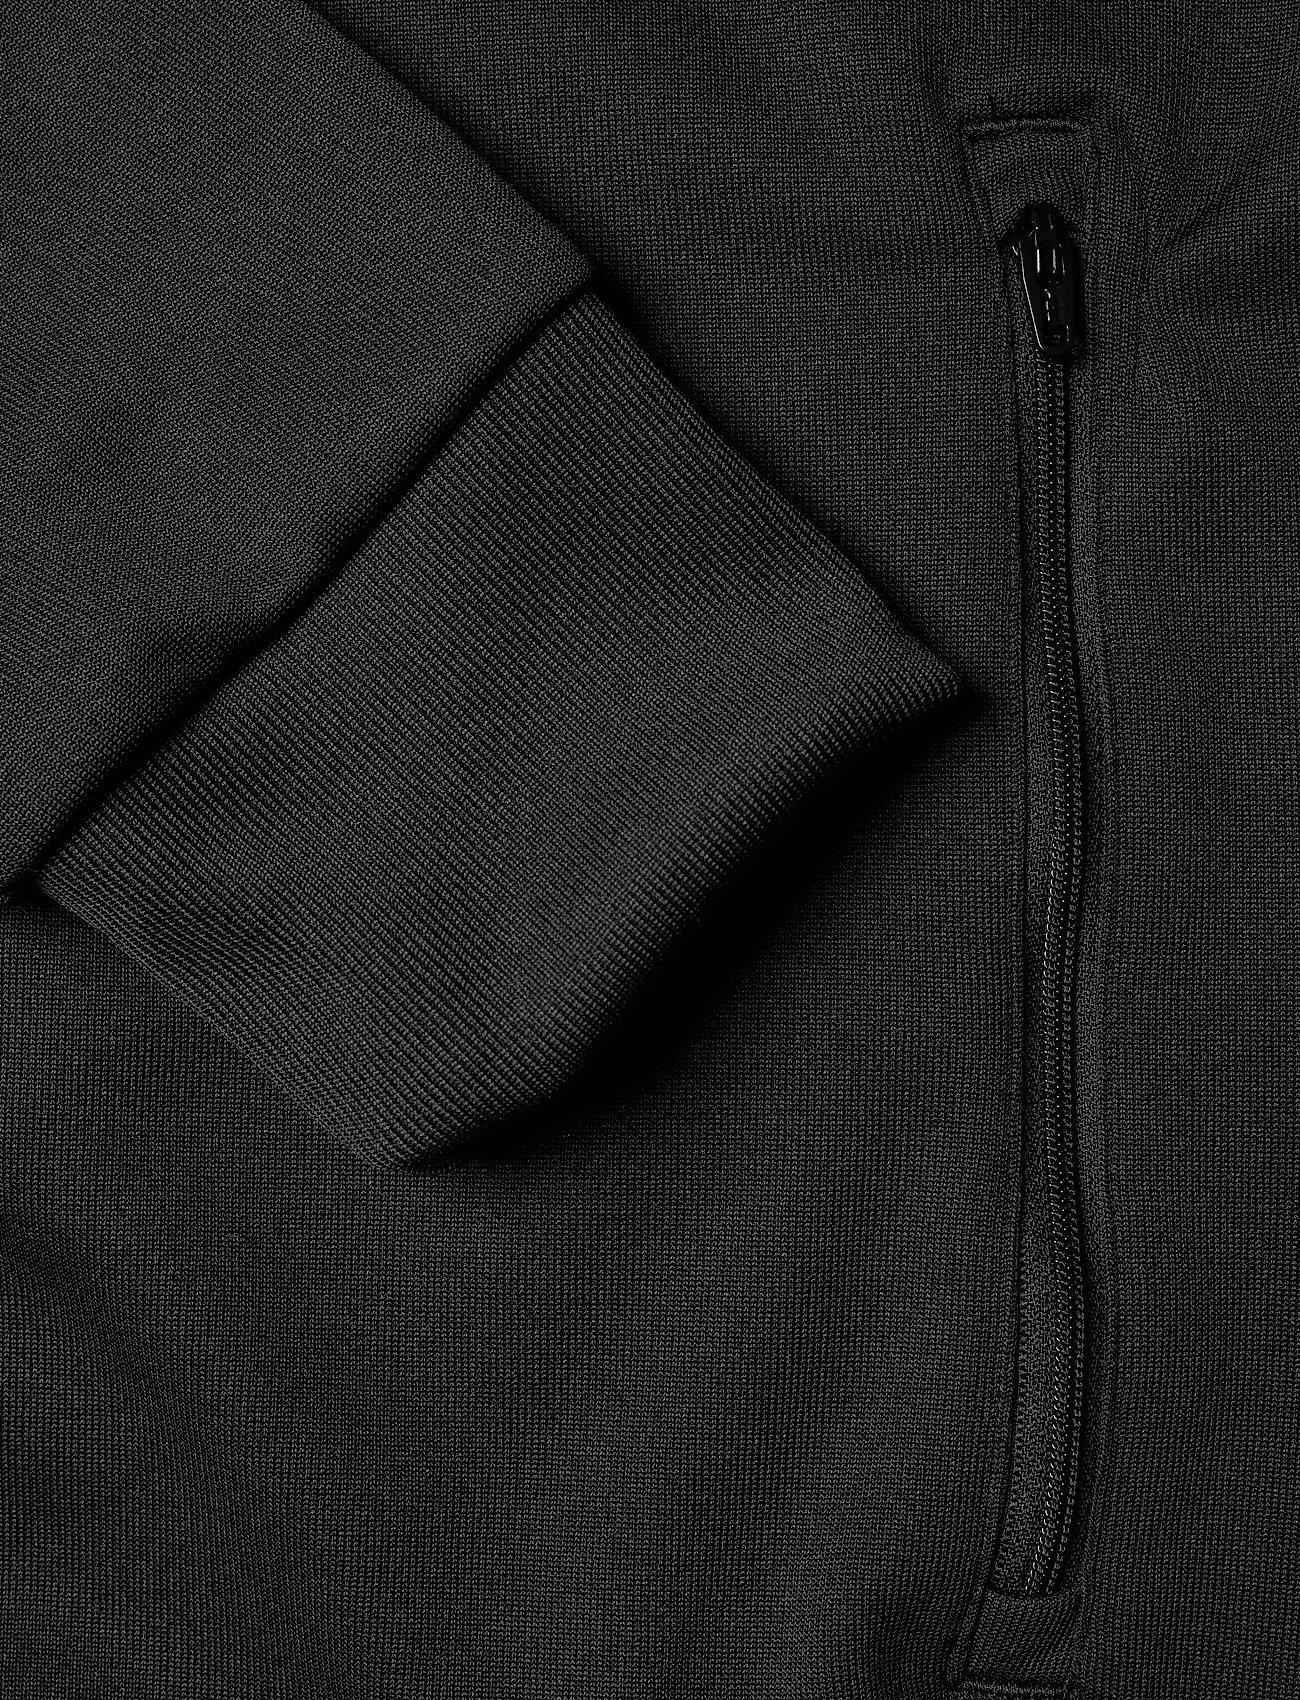 Essential Tt (Black) (48.71 €) - adidas Originals EYMQC